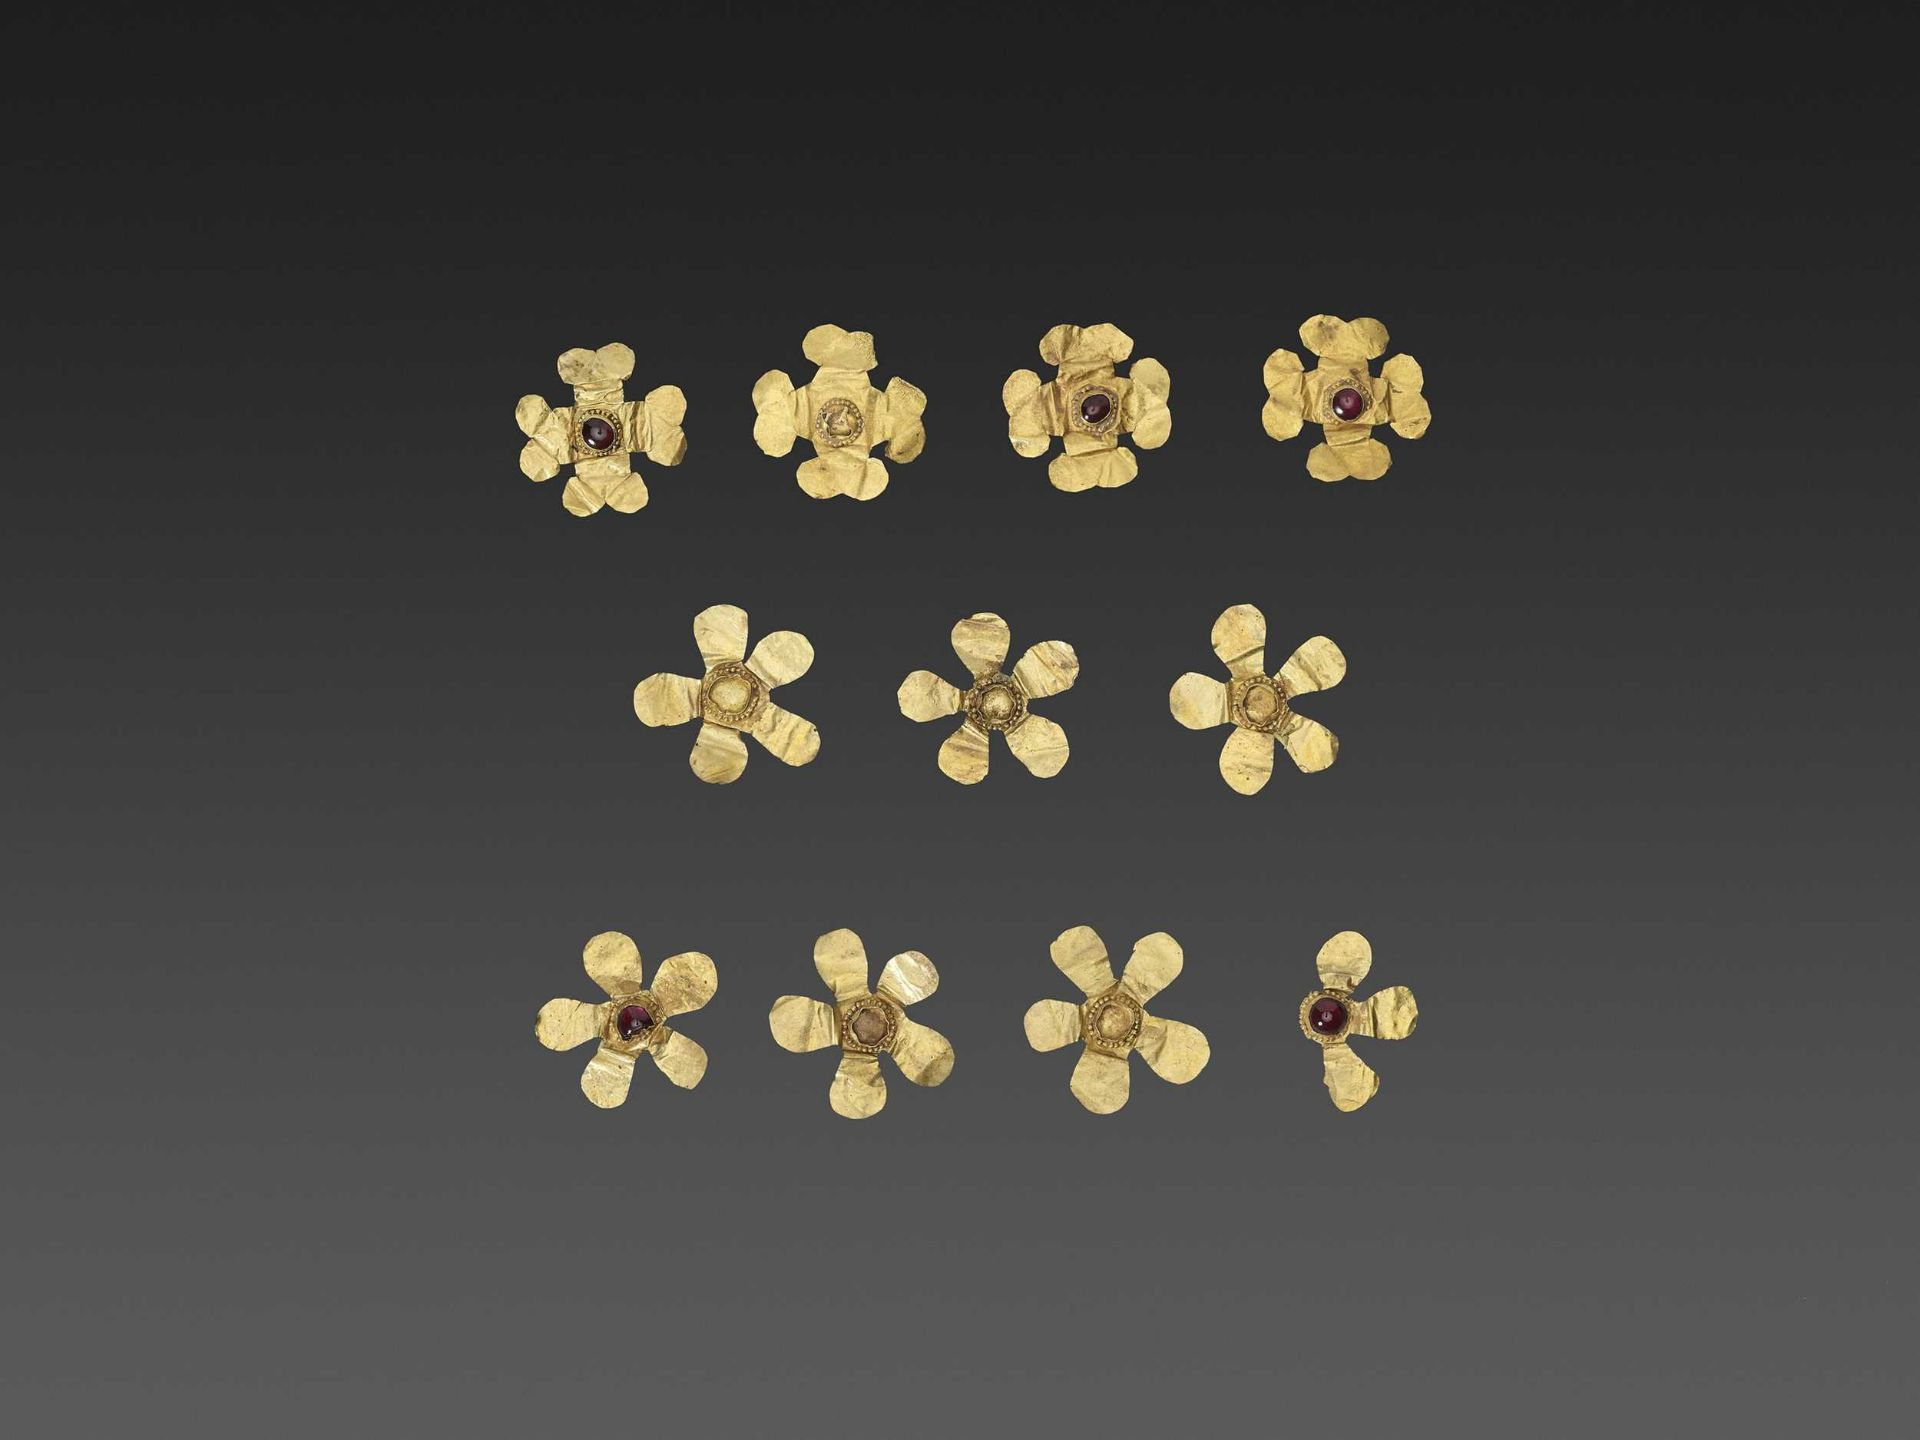 11 BACTRIAN GOLD 'FLOWER' GARMENT ORNAMENTS